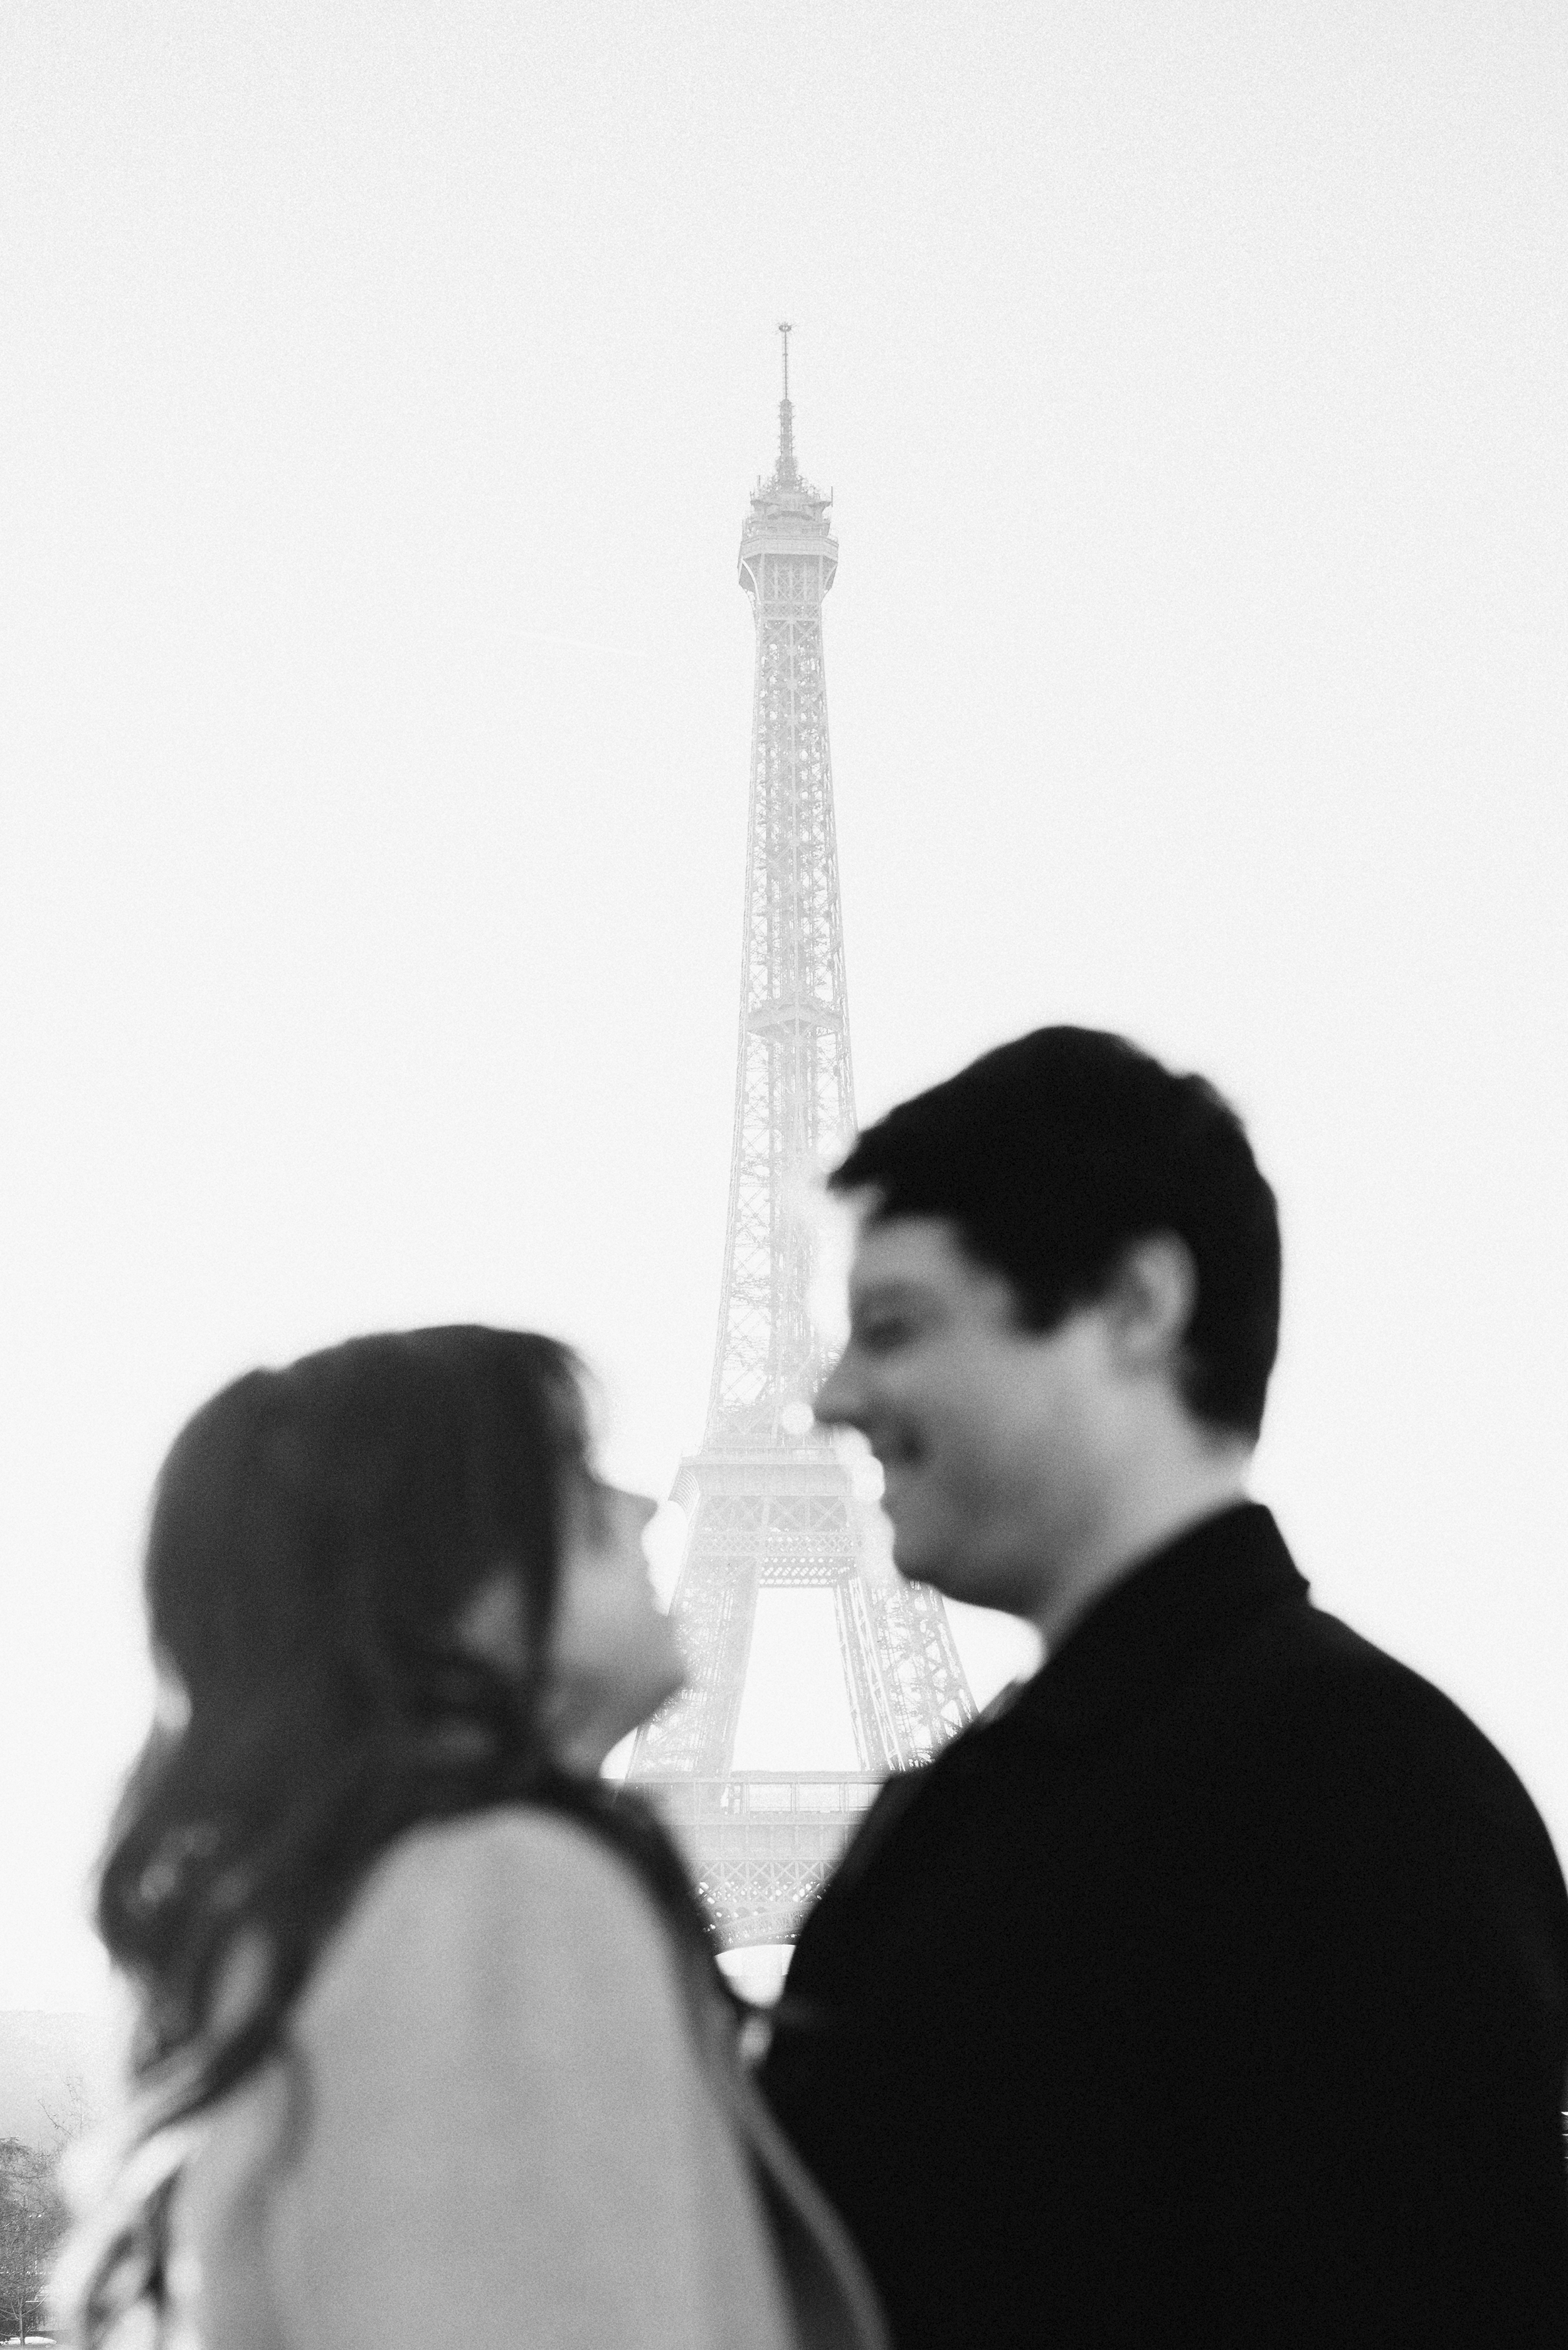 Anniversary-photoshoot-Paris-Trocadero-EiffelTower-Cafe-004.jpg